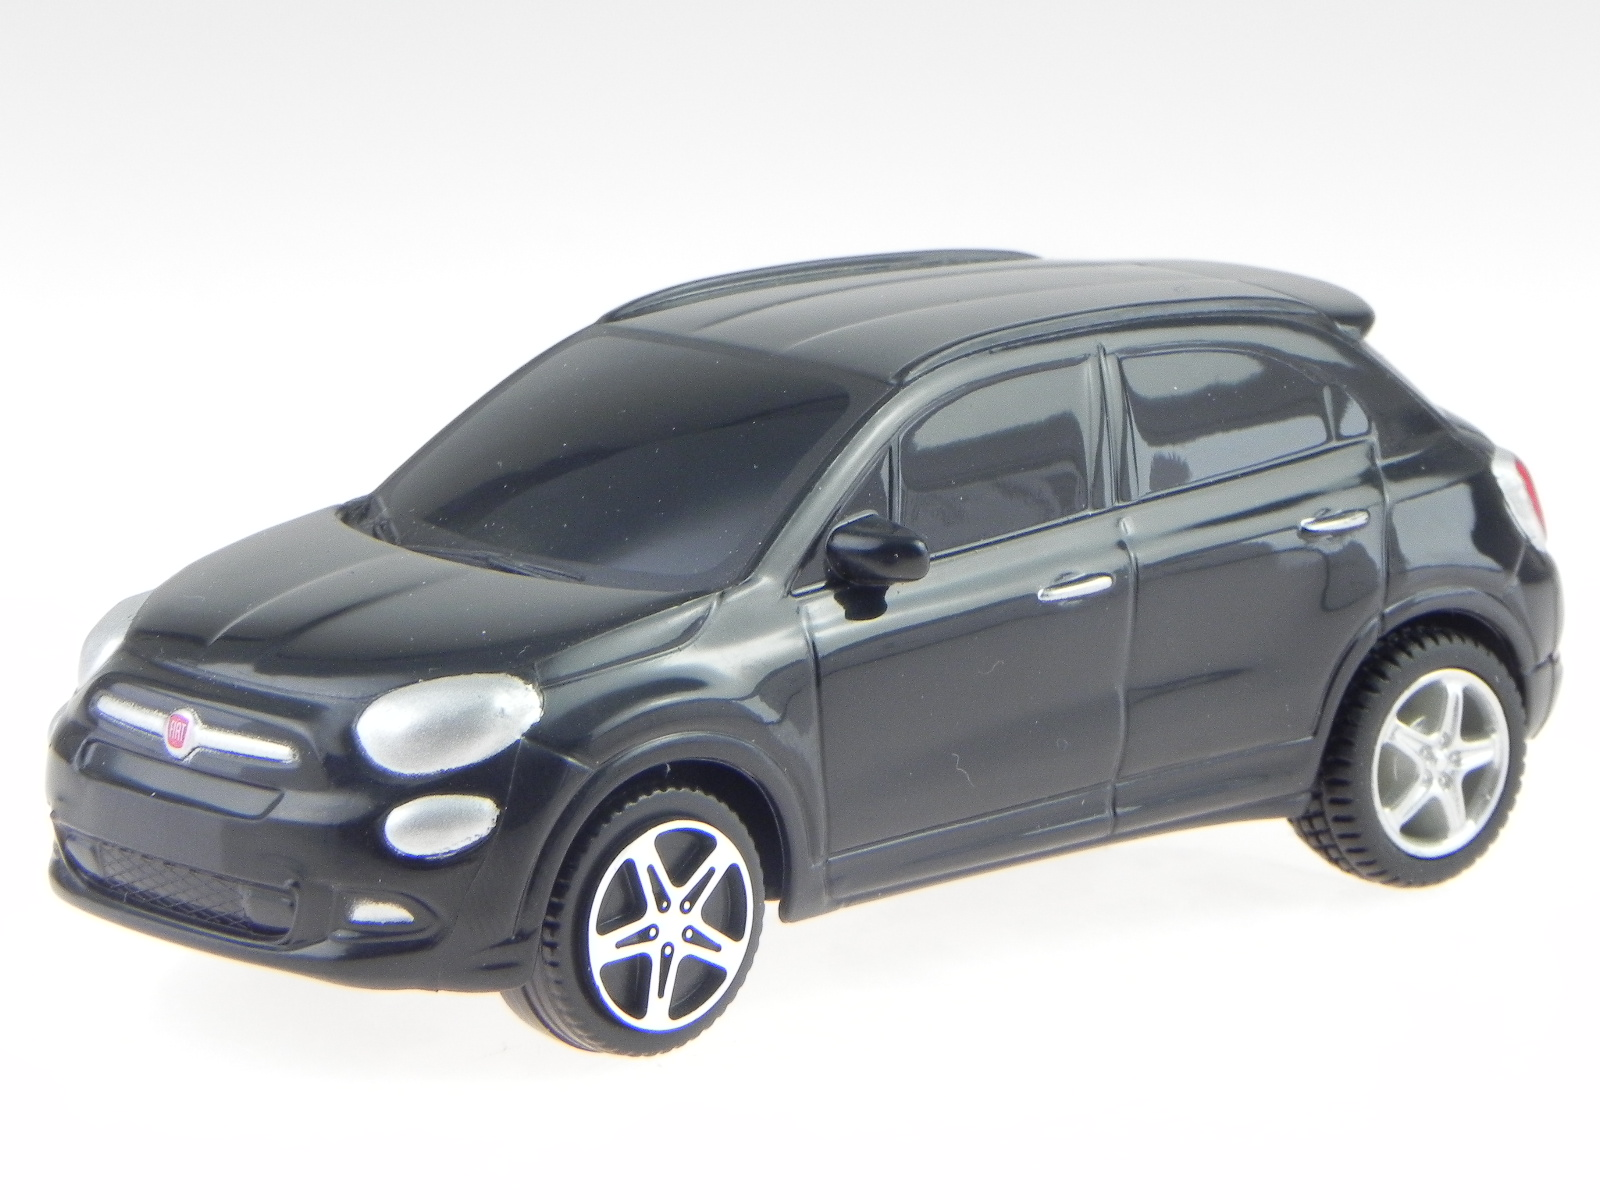 Fiat 500X 500 X schwarz Modellauto 18-30505Z Bburago 1:43